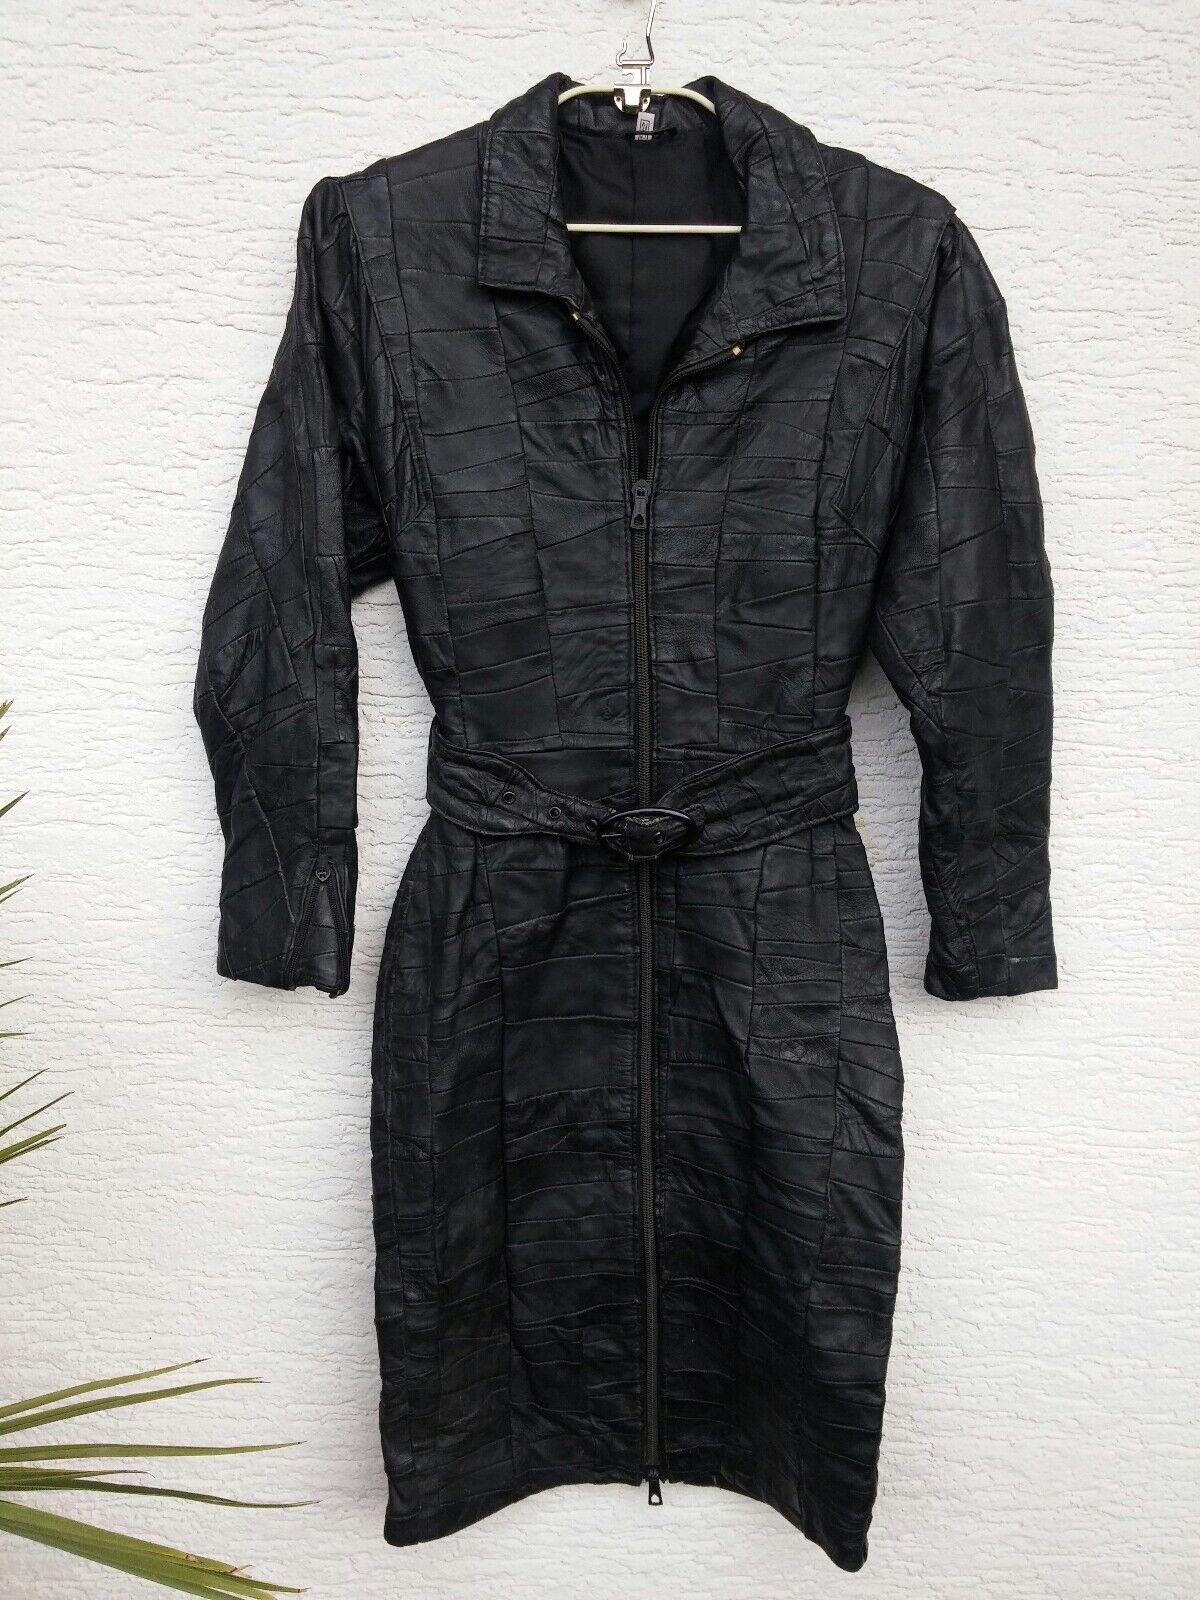 Sexy Lederkleid echt Leder Kleid Patchwork - NGr.34